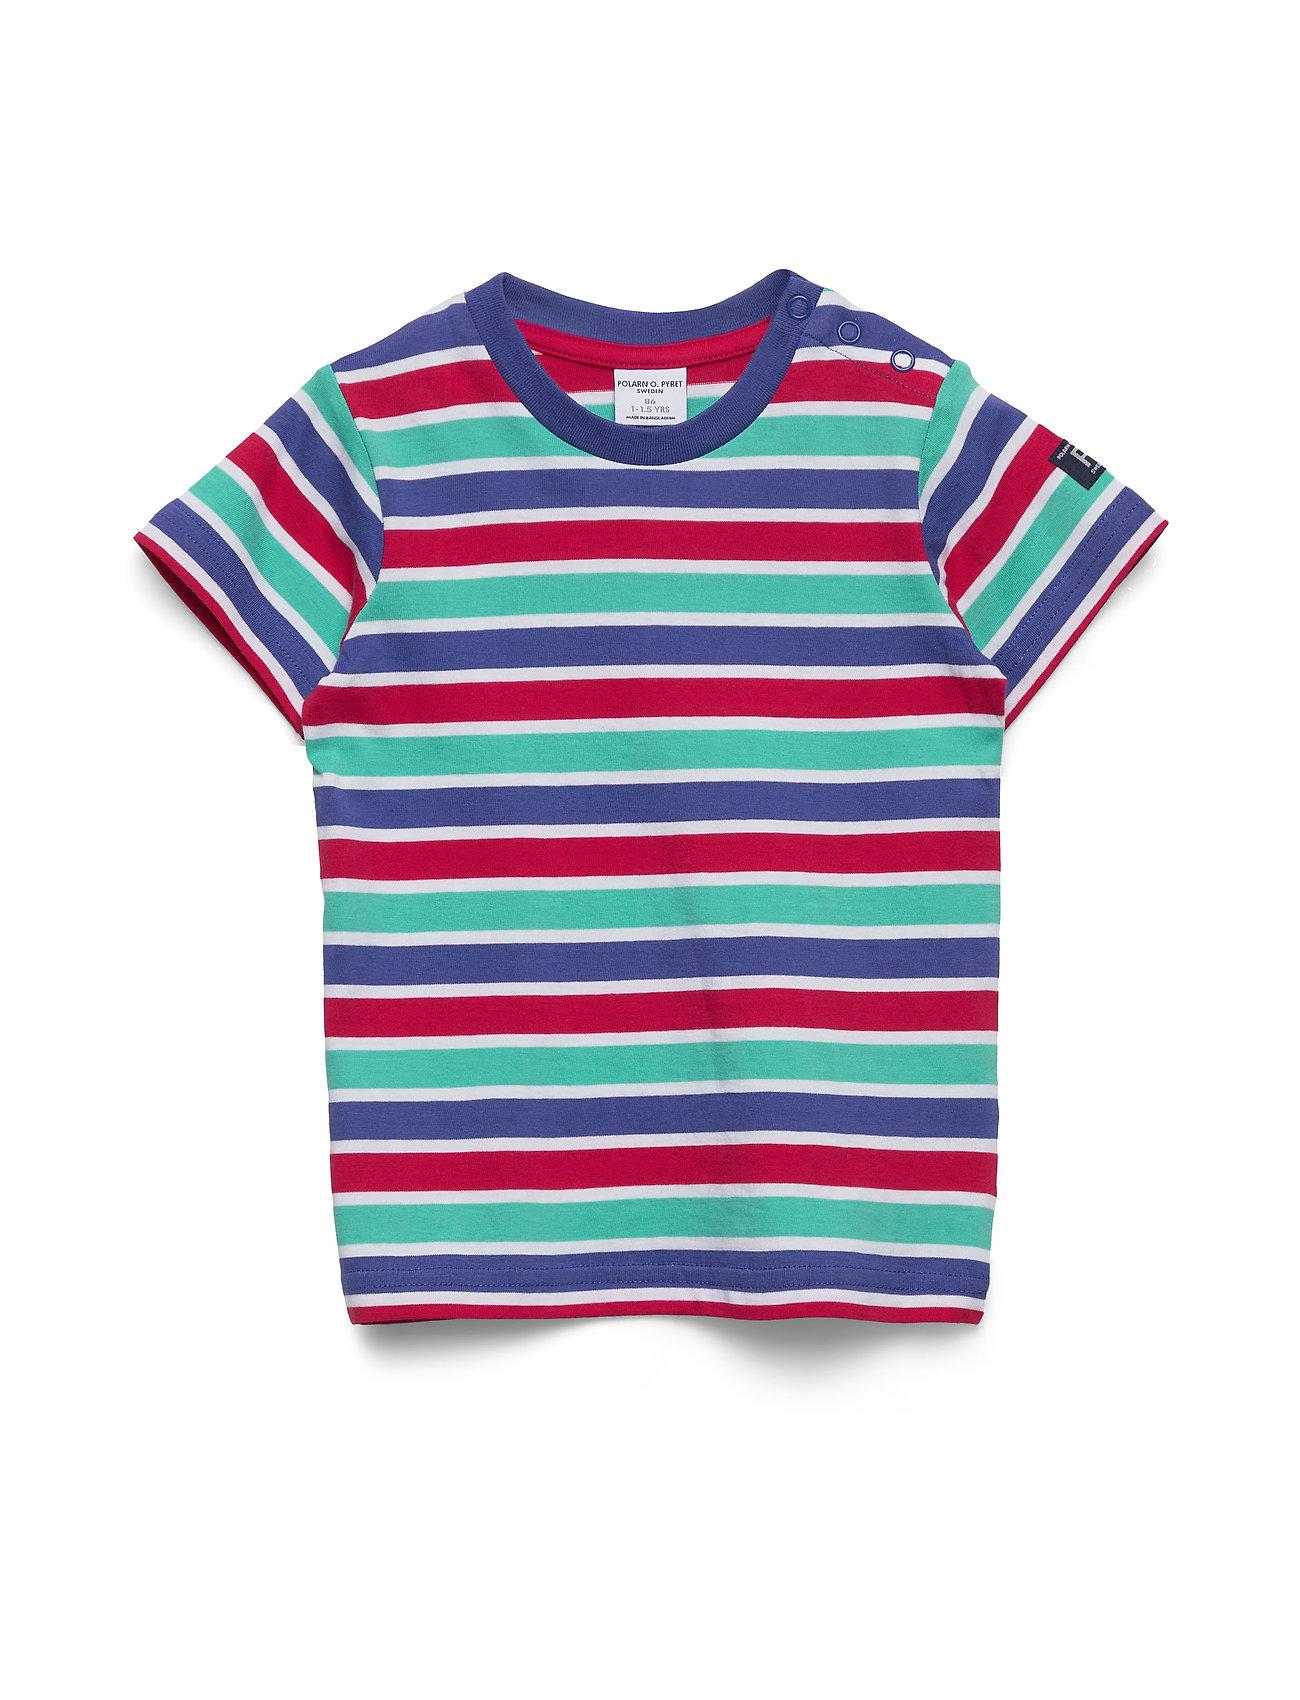 Polarn O. Pyret T-shirt S/S striped Pre- School - TIGERLILY